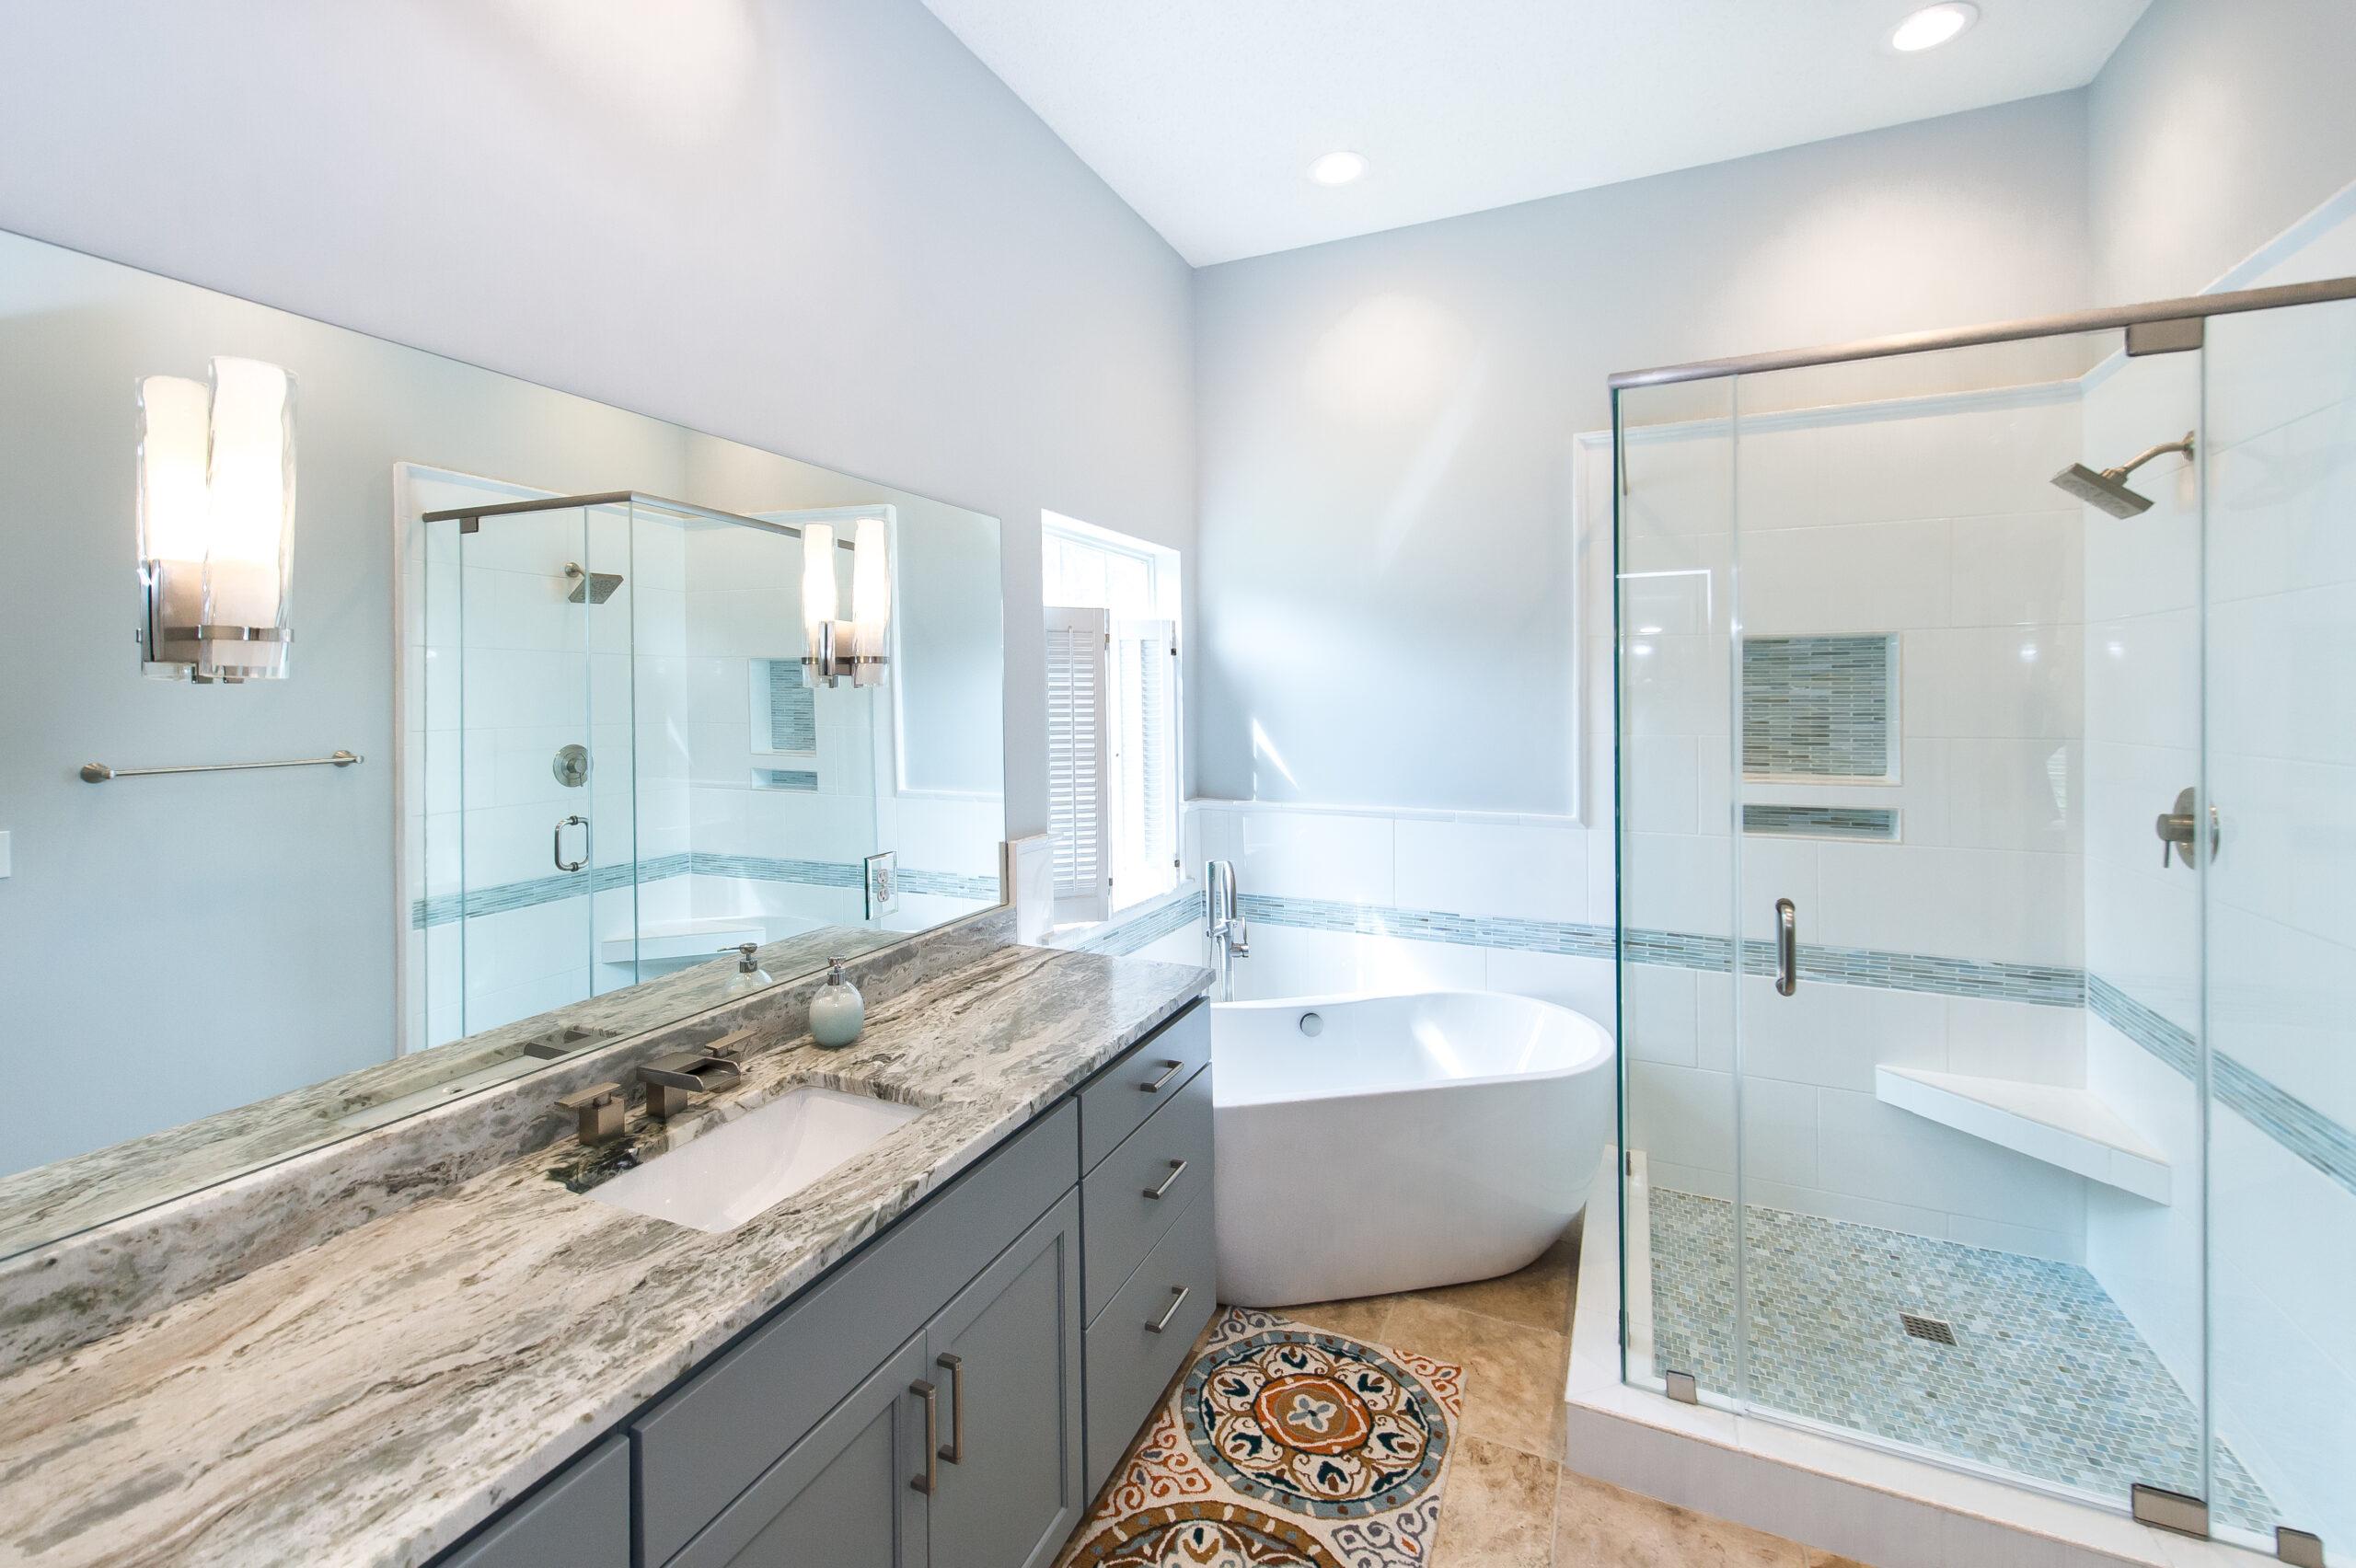 Piazza Kitchen & Bathroom Renovation